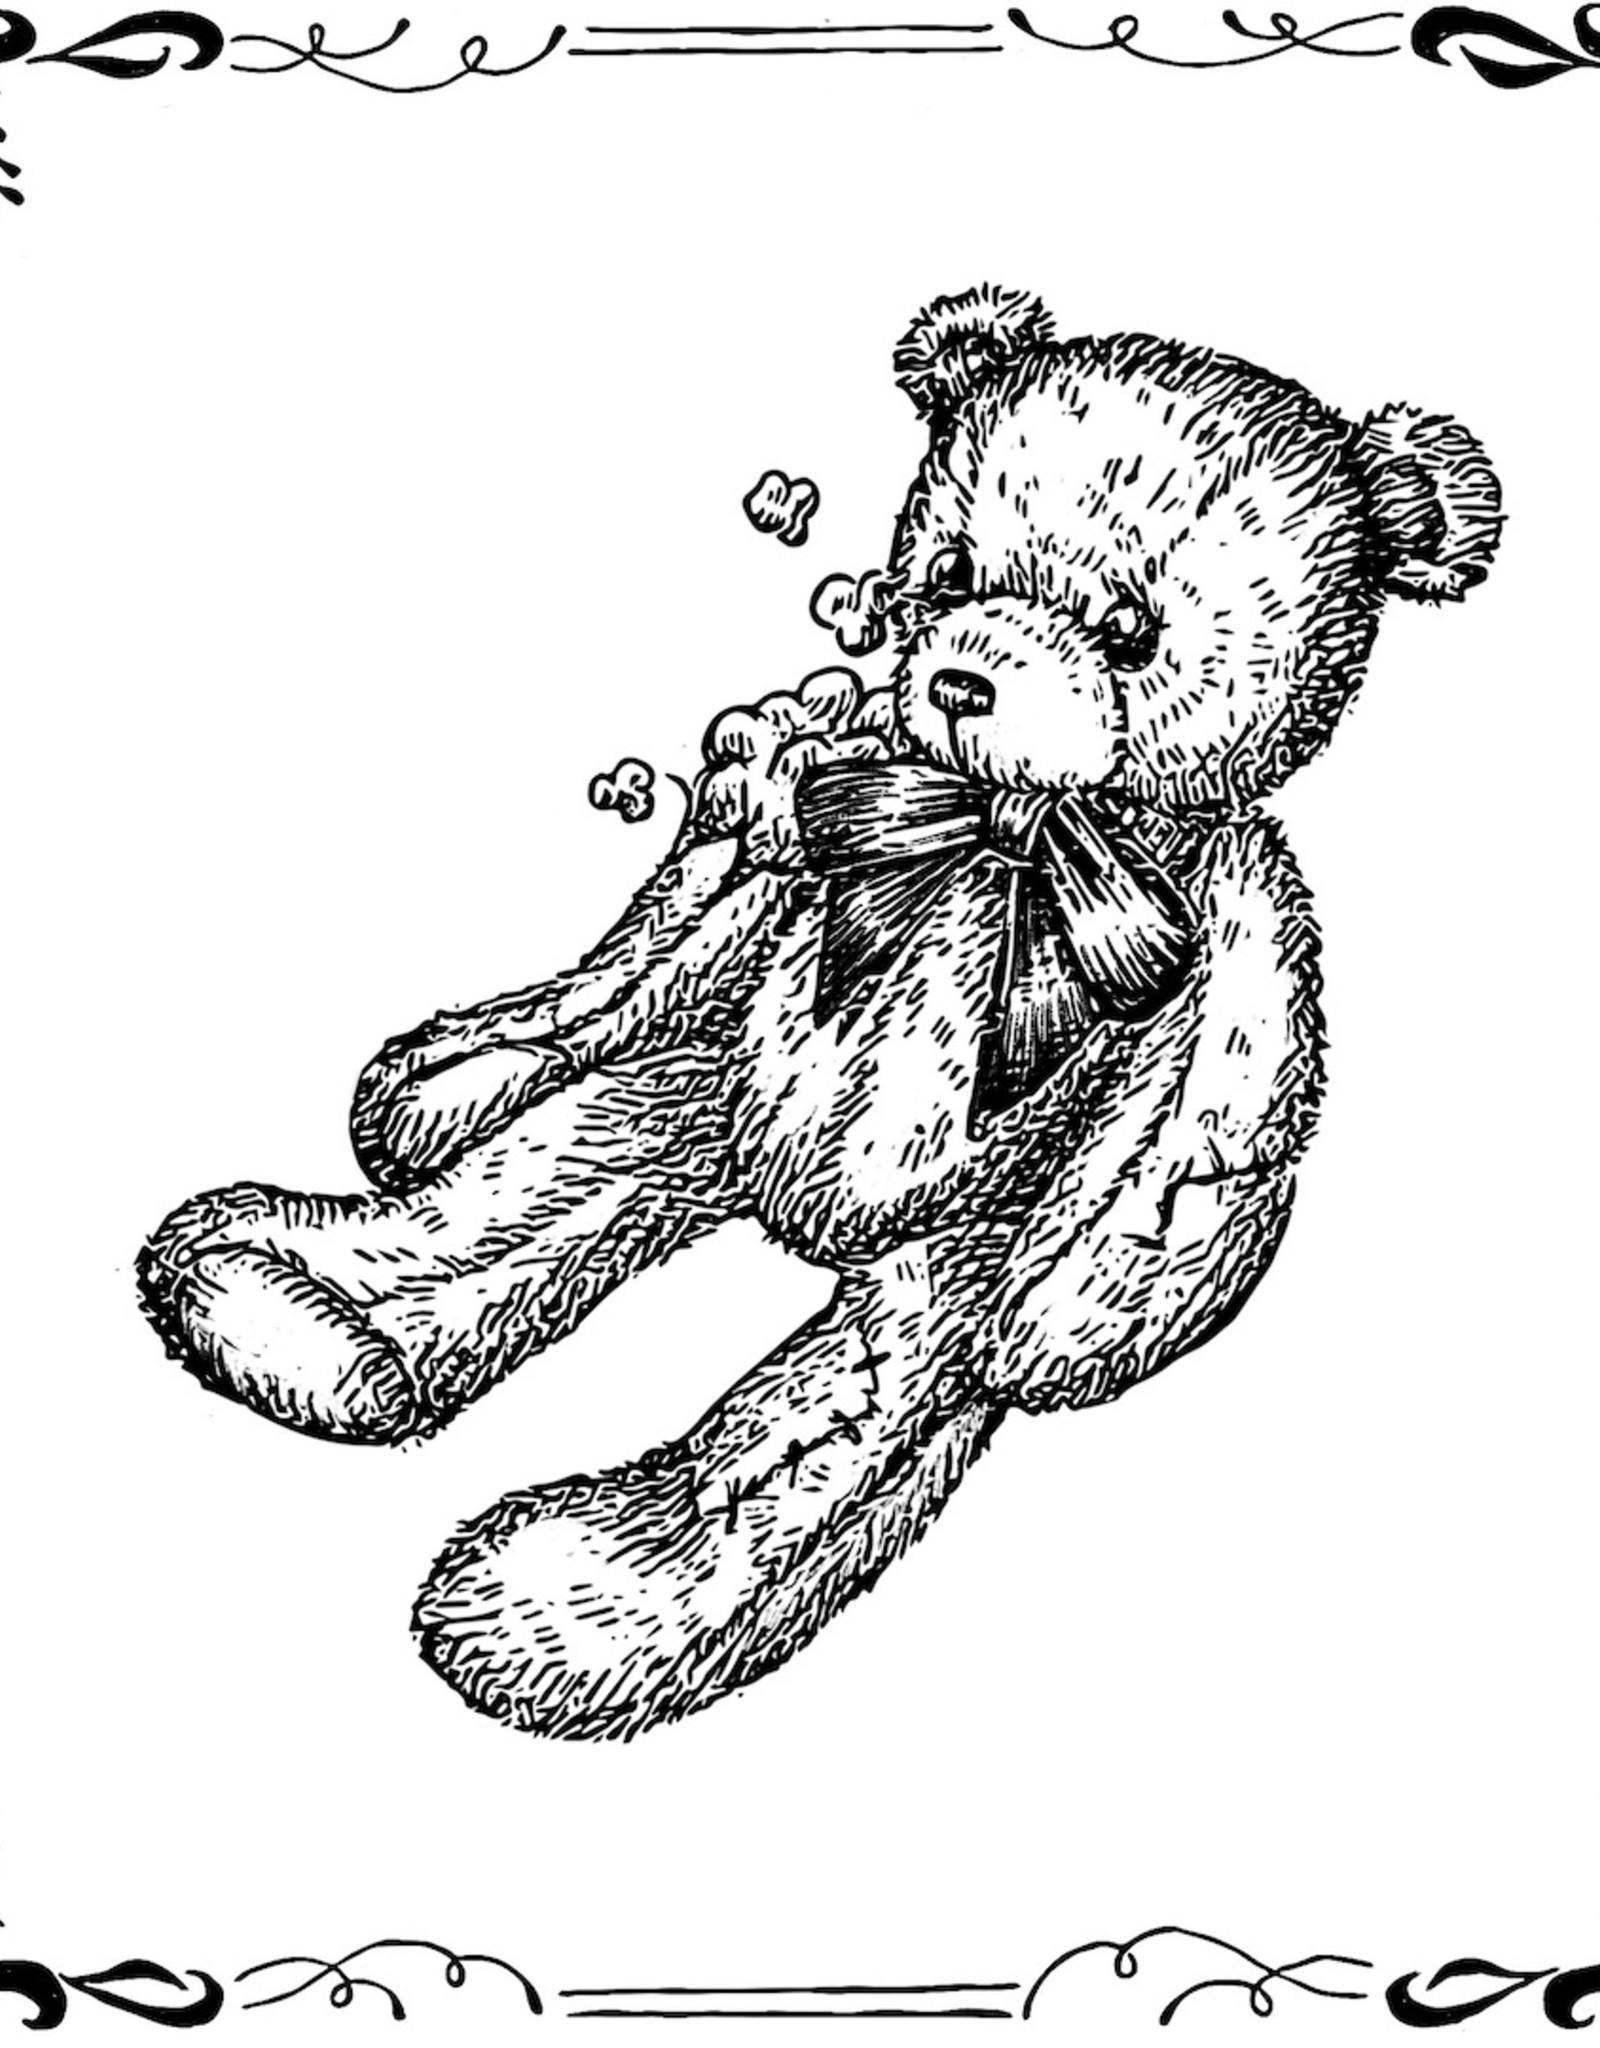 """Worn and Torn Teddy Bear"" print by Alli Davis / slxpxke"